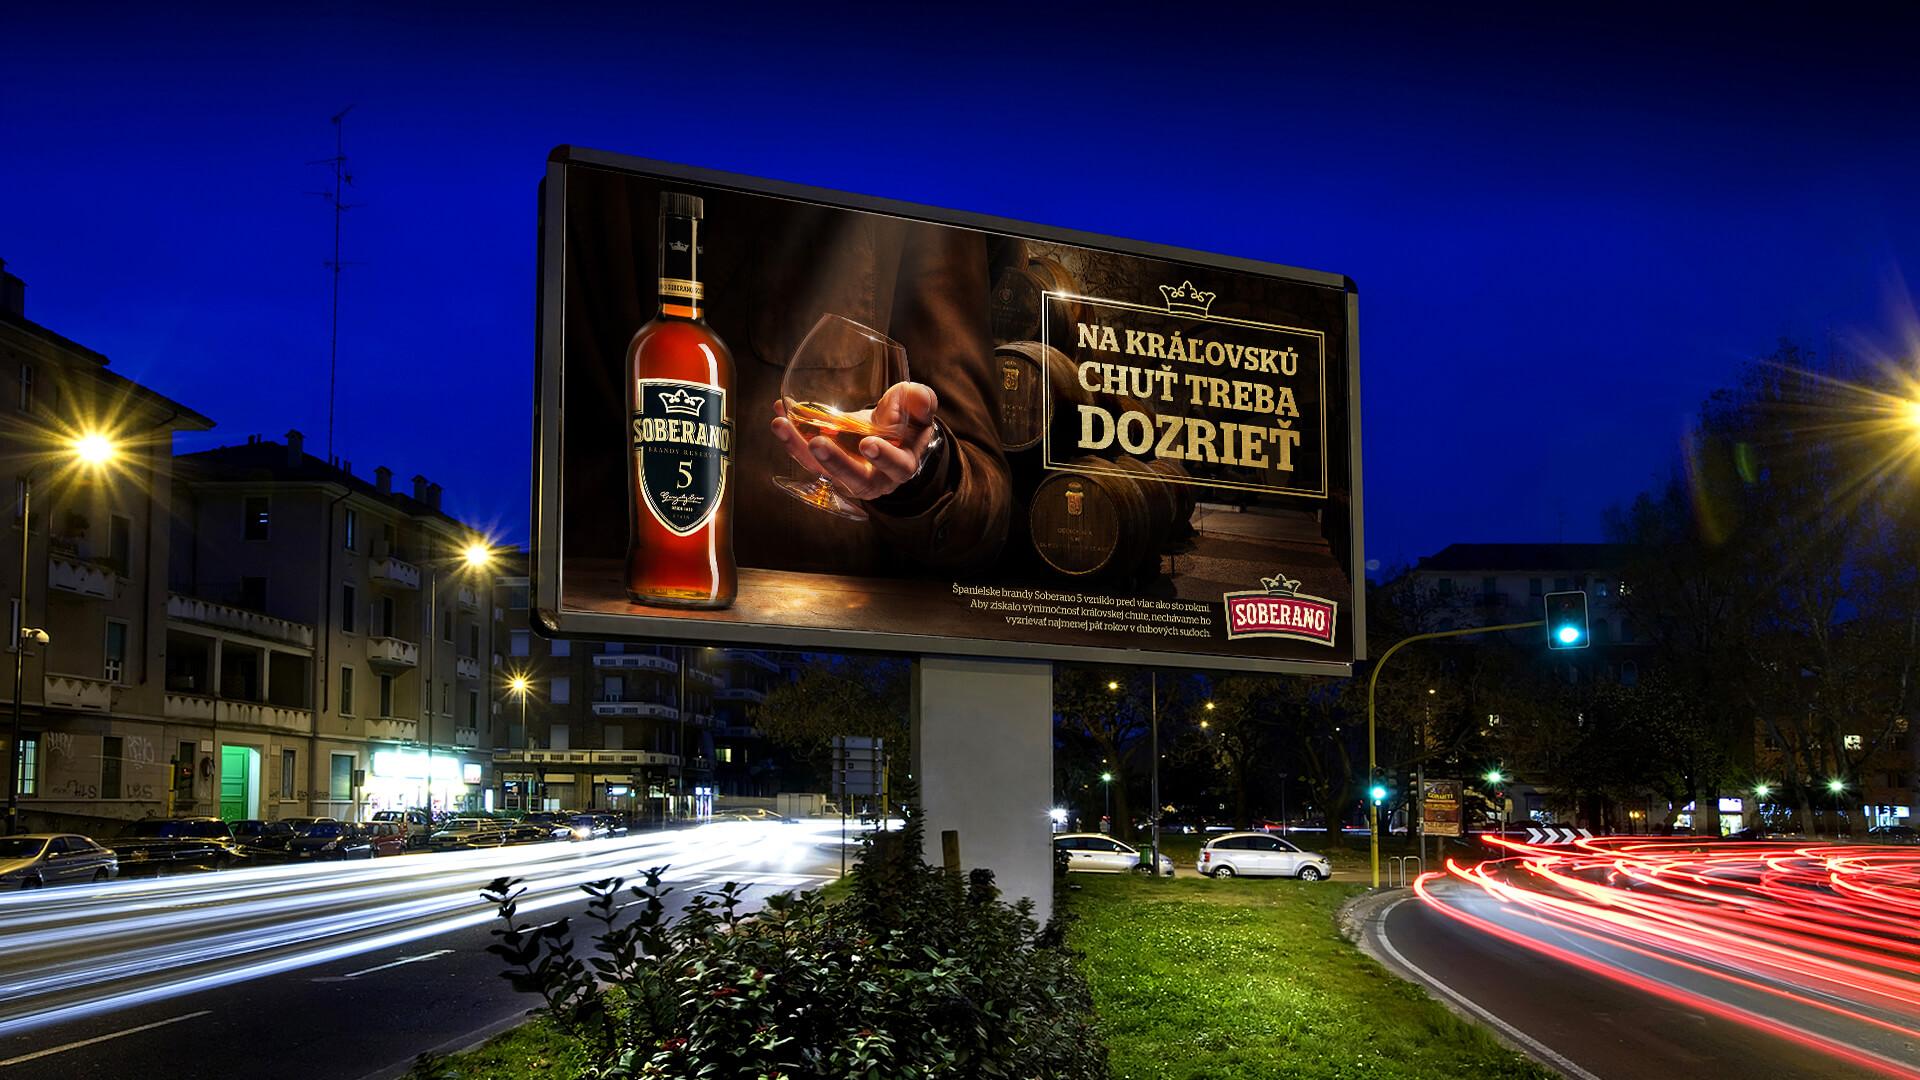 soberano billboard